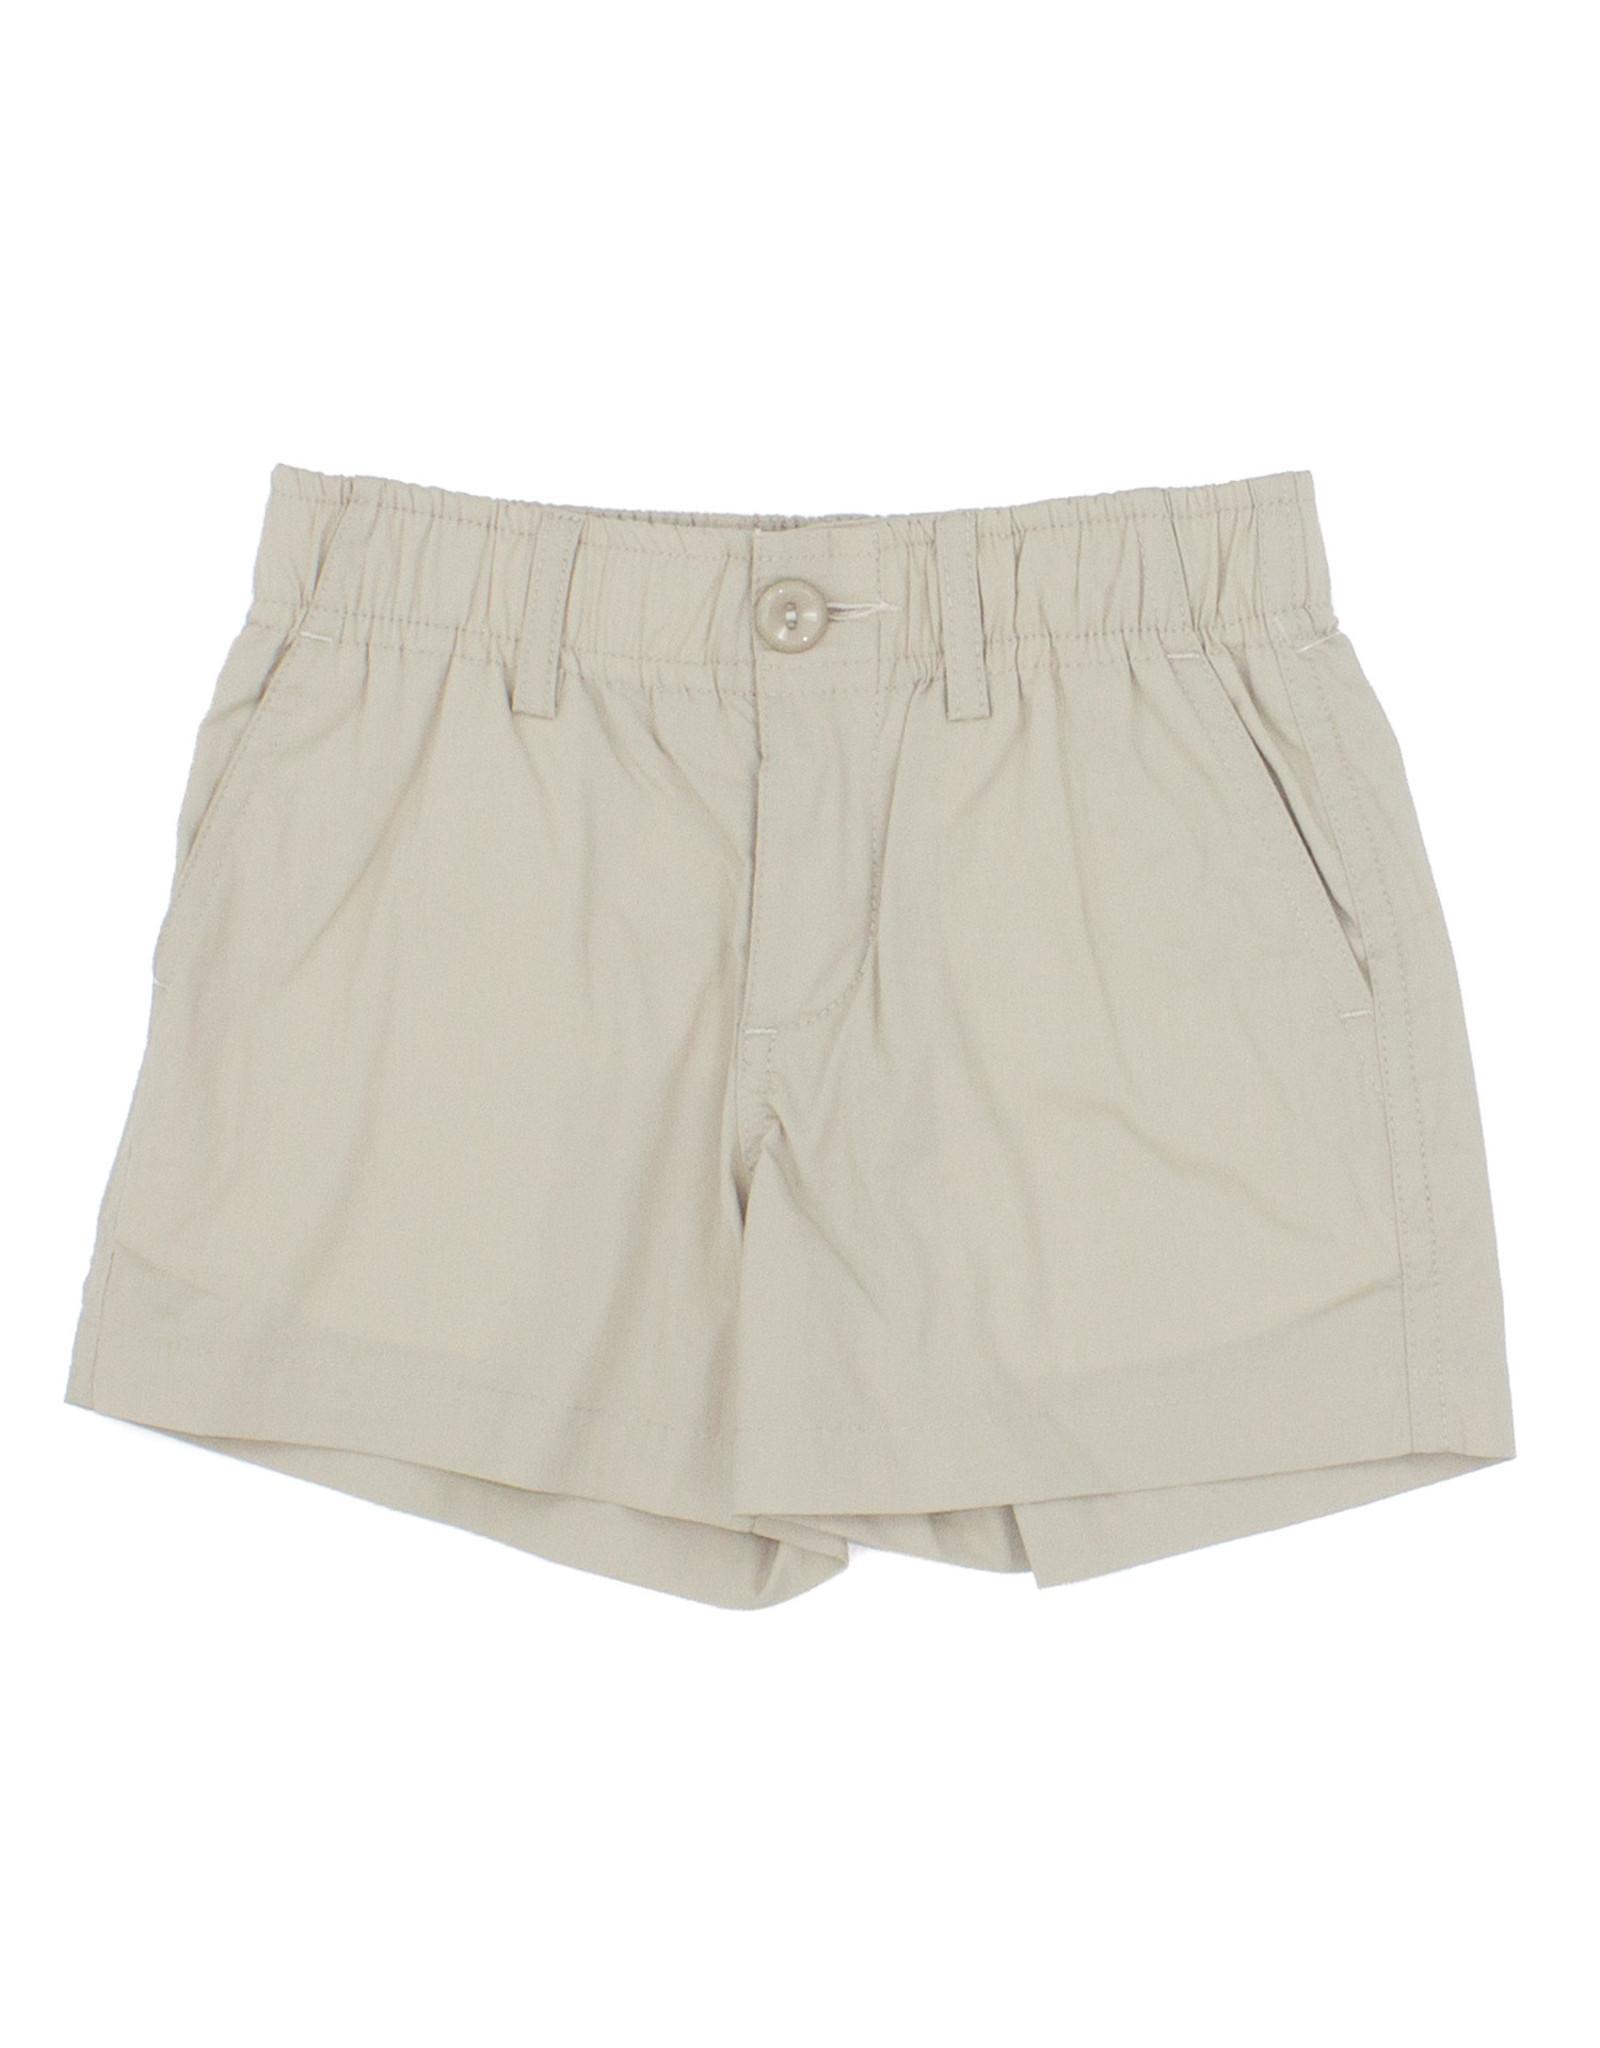 Properly Tied Properly Tied Augusta Shorts, Khaki